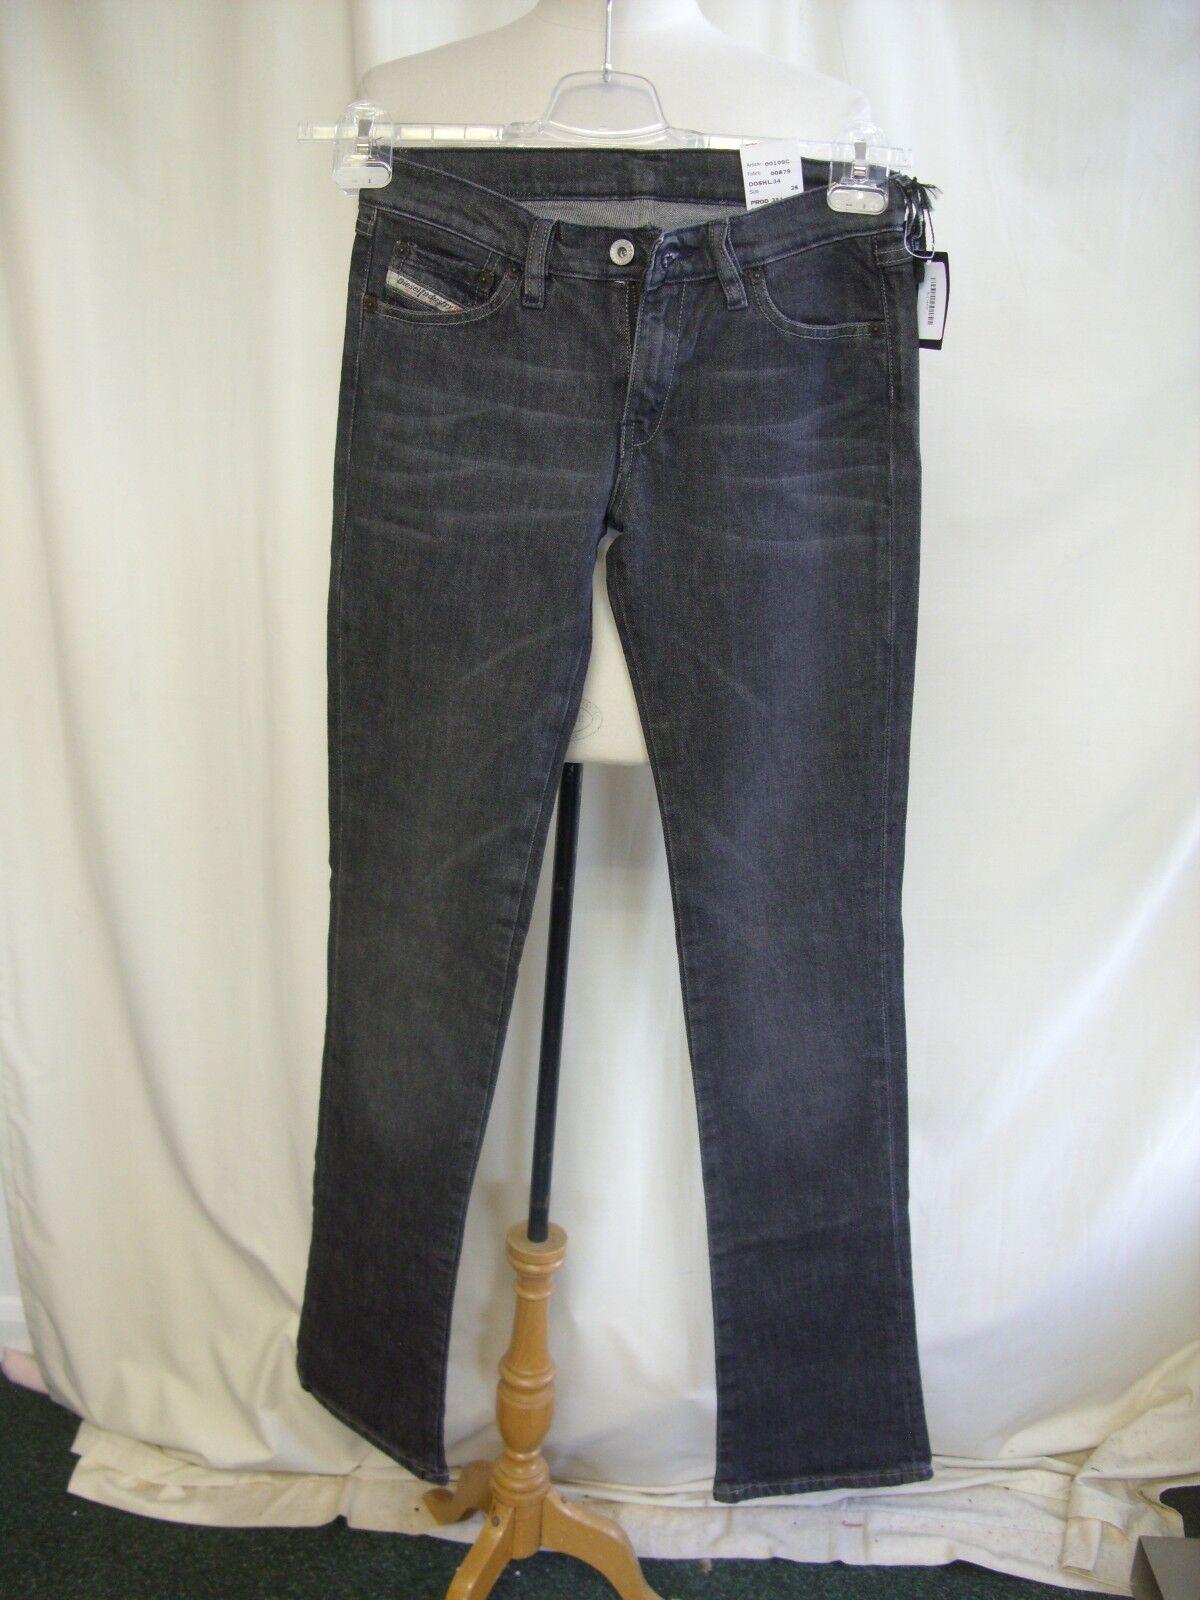 Ladies Jeans Diesel grau stonewash waist 26  inside leg 35  slim stretch 7842